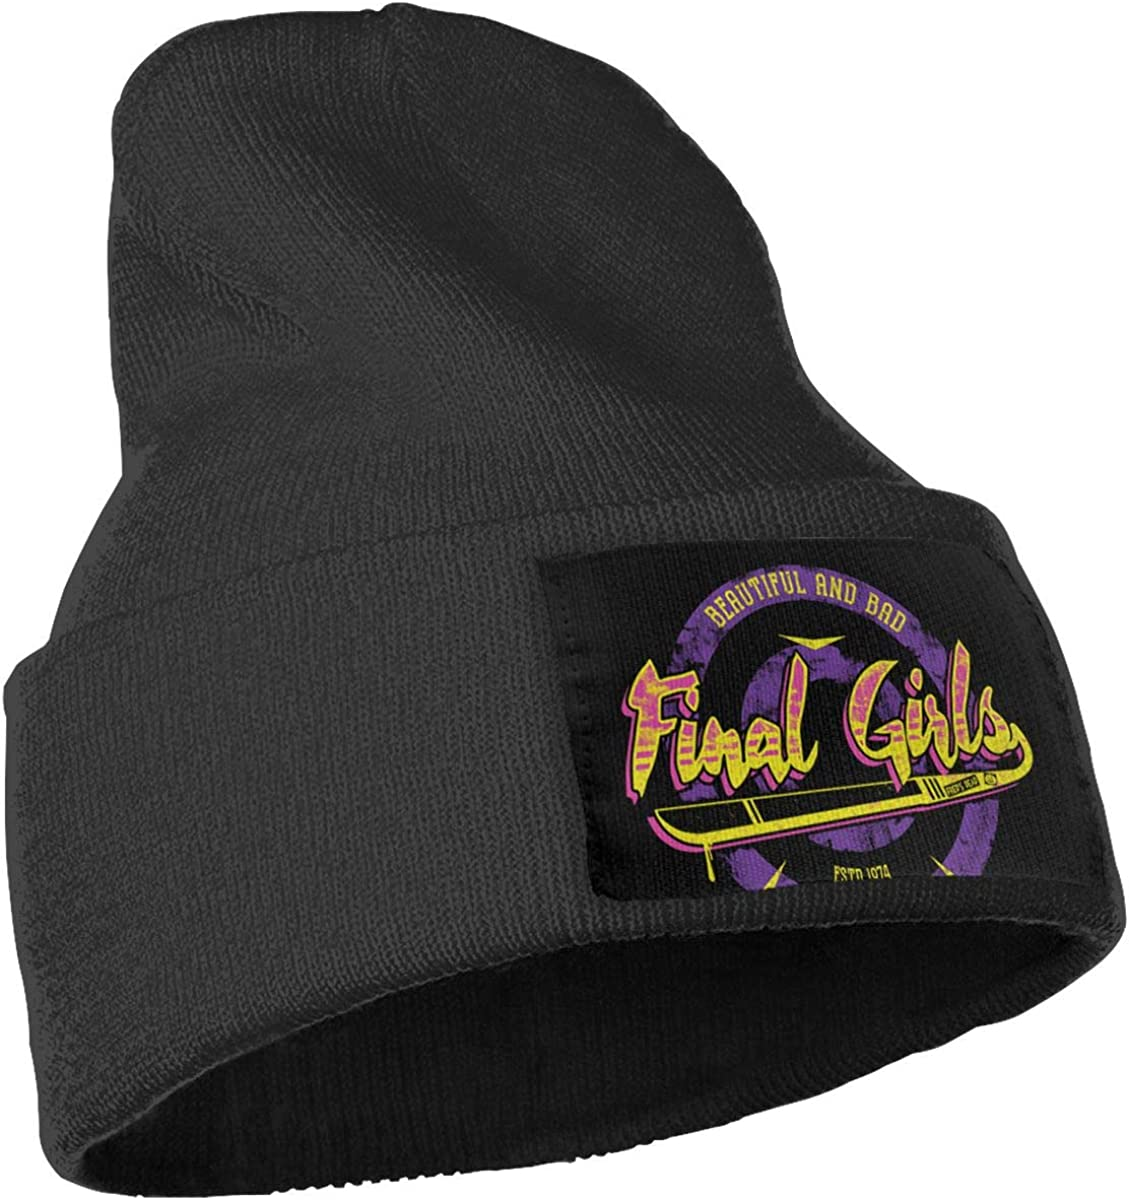 JimHappy Final Girls Winter Warm Hats,Knit Slouchy Thick Skull Cap Black